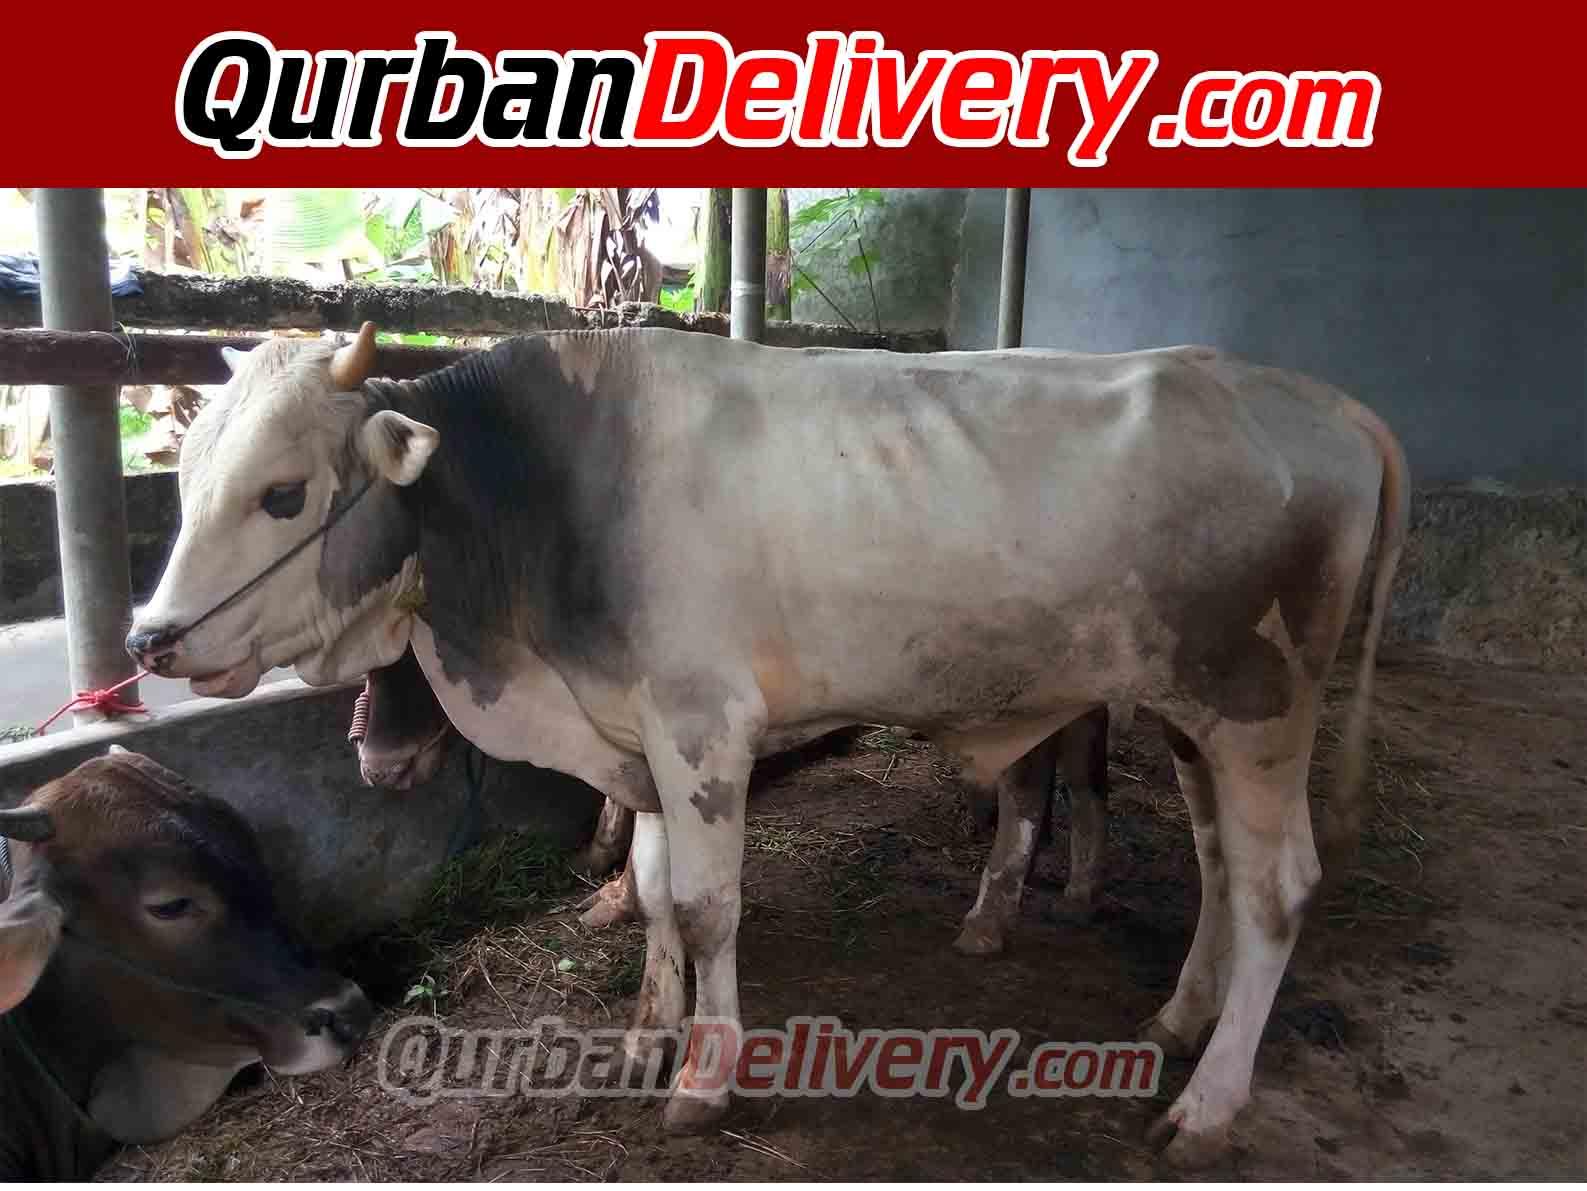 Harga Kambing Qurban Saat Ini Prediksi 2020-Qurban Delivery